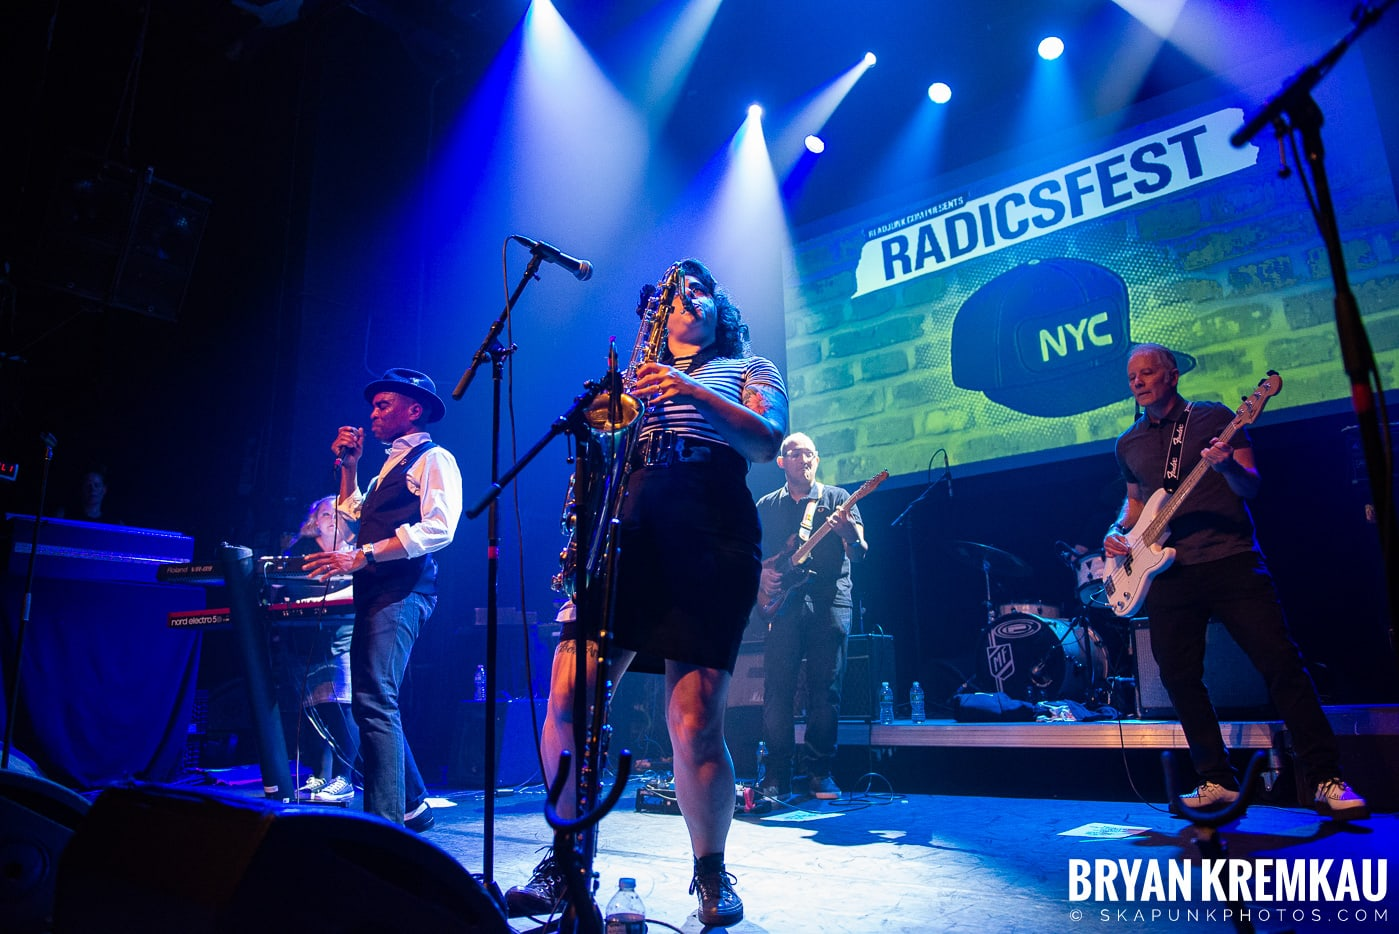 Rude Boy George @ Radicsfest, Gramercy Theatre, NYC - 7.19.19 (18)